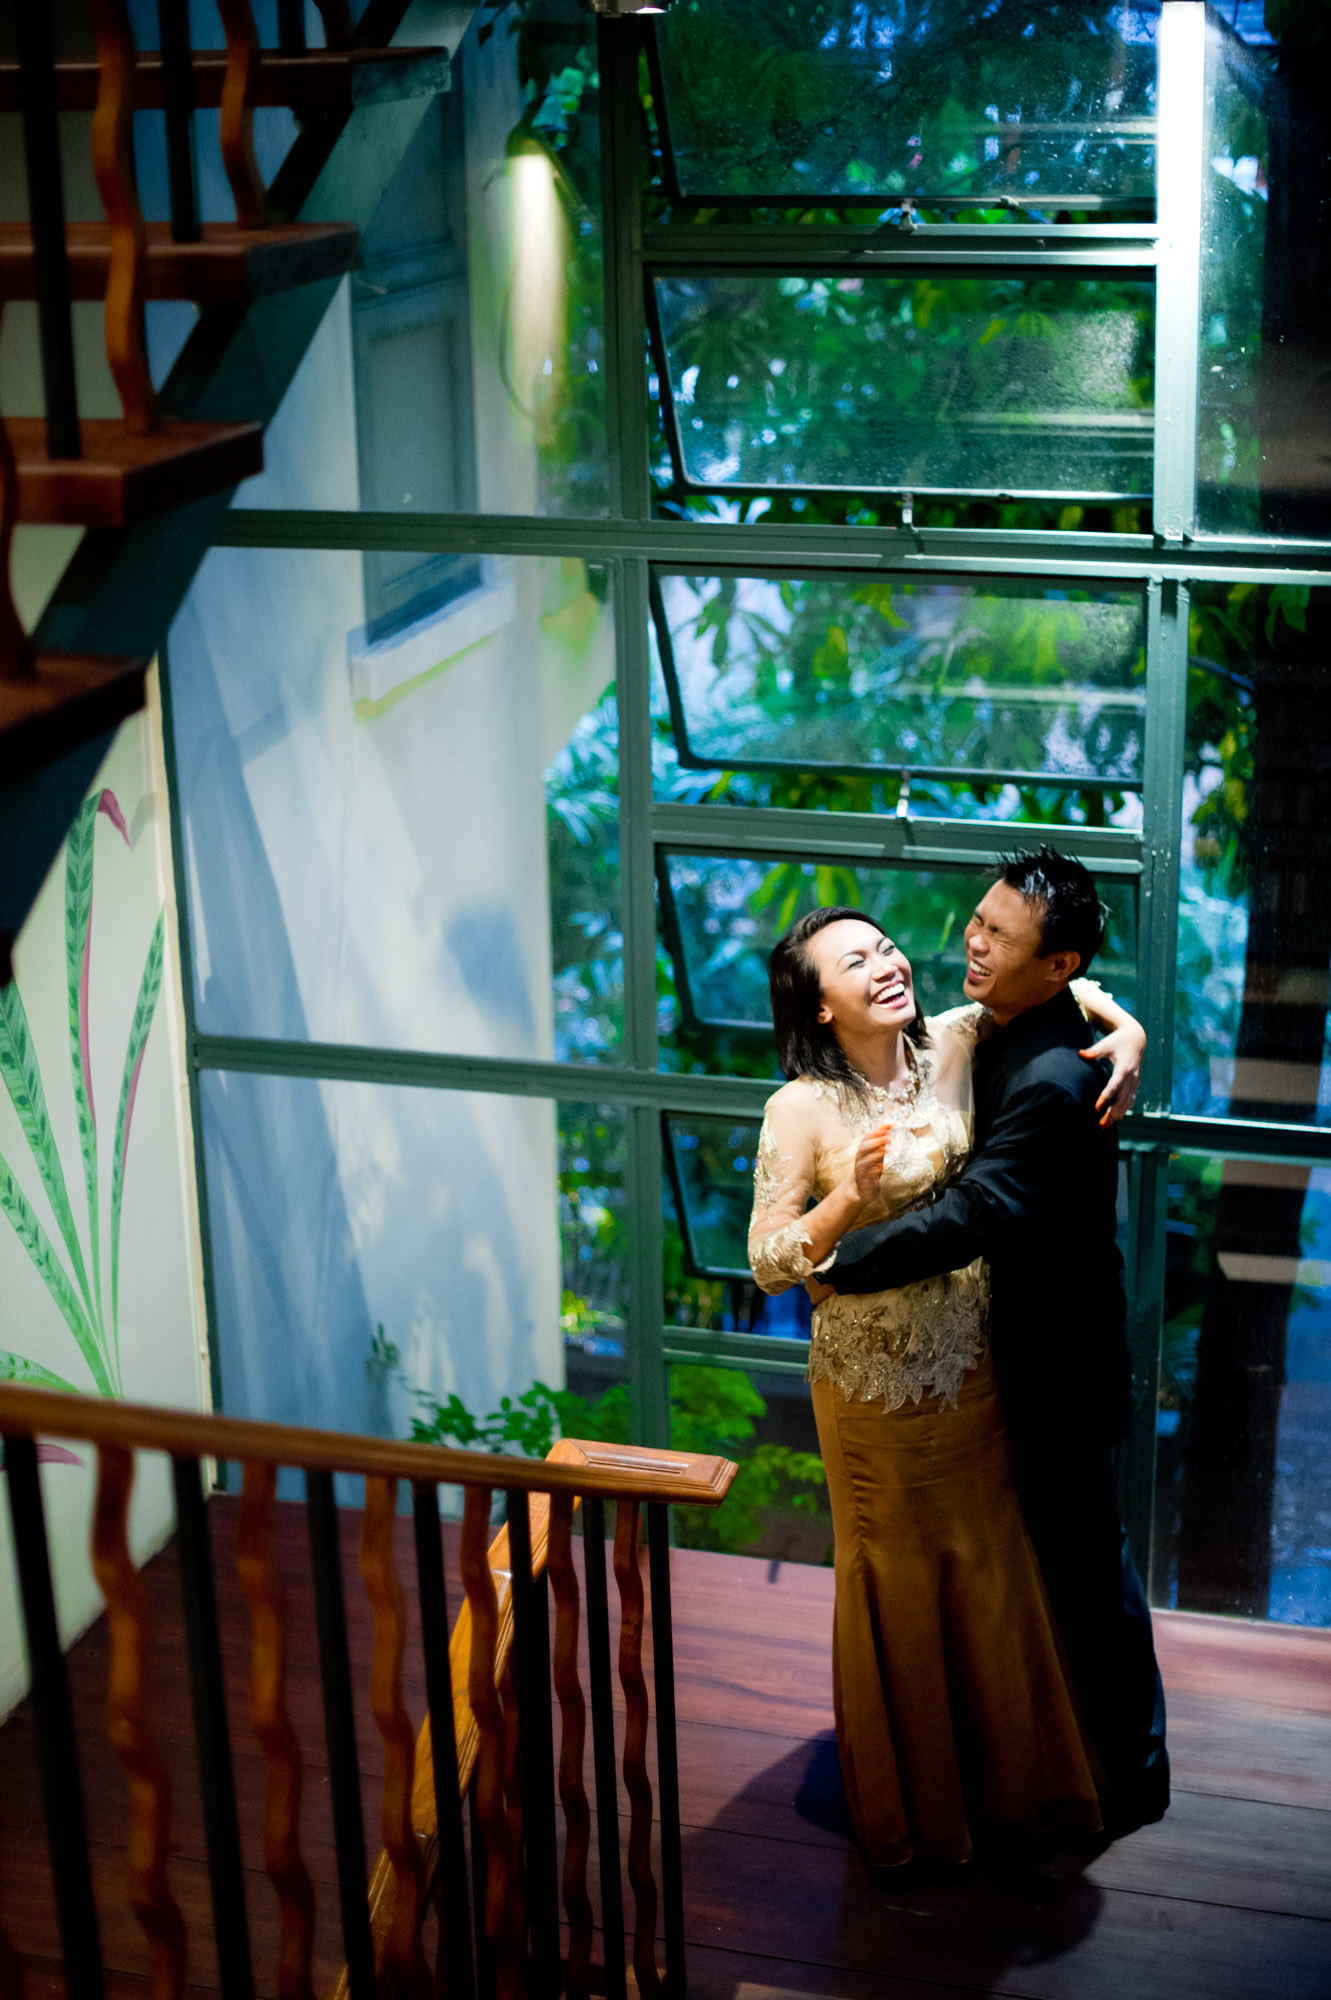 Bangkok engagement session (pre-wedding, prenuptial) at Ariyasom Villa in Thailand.